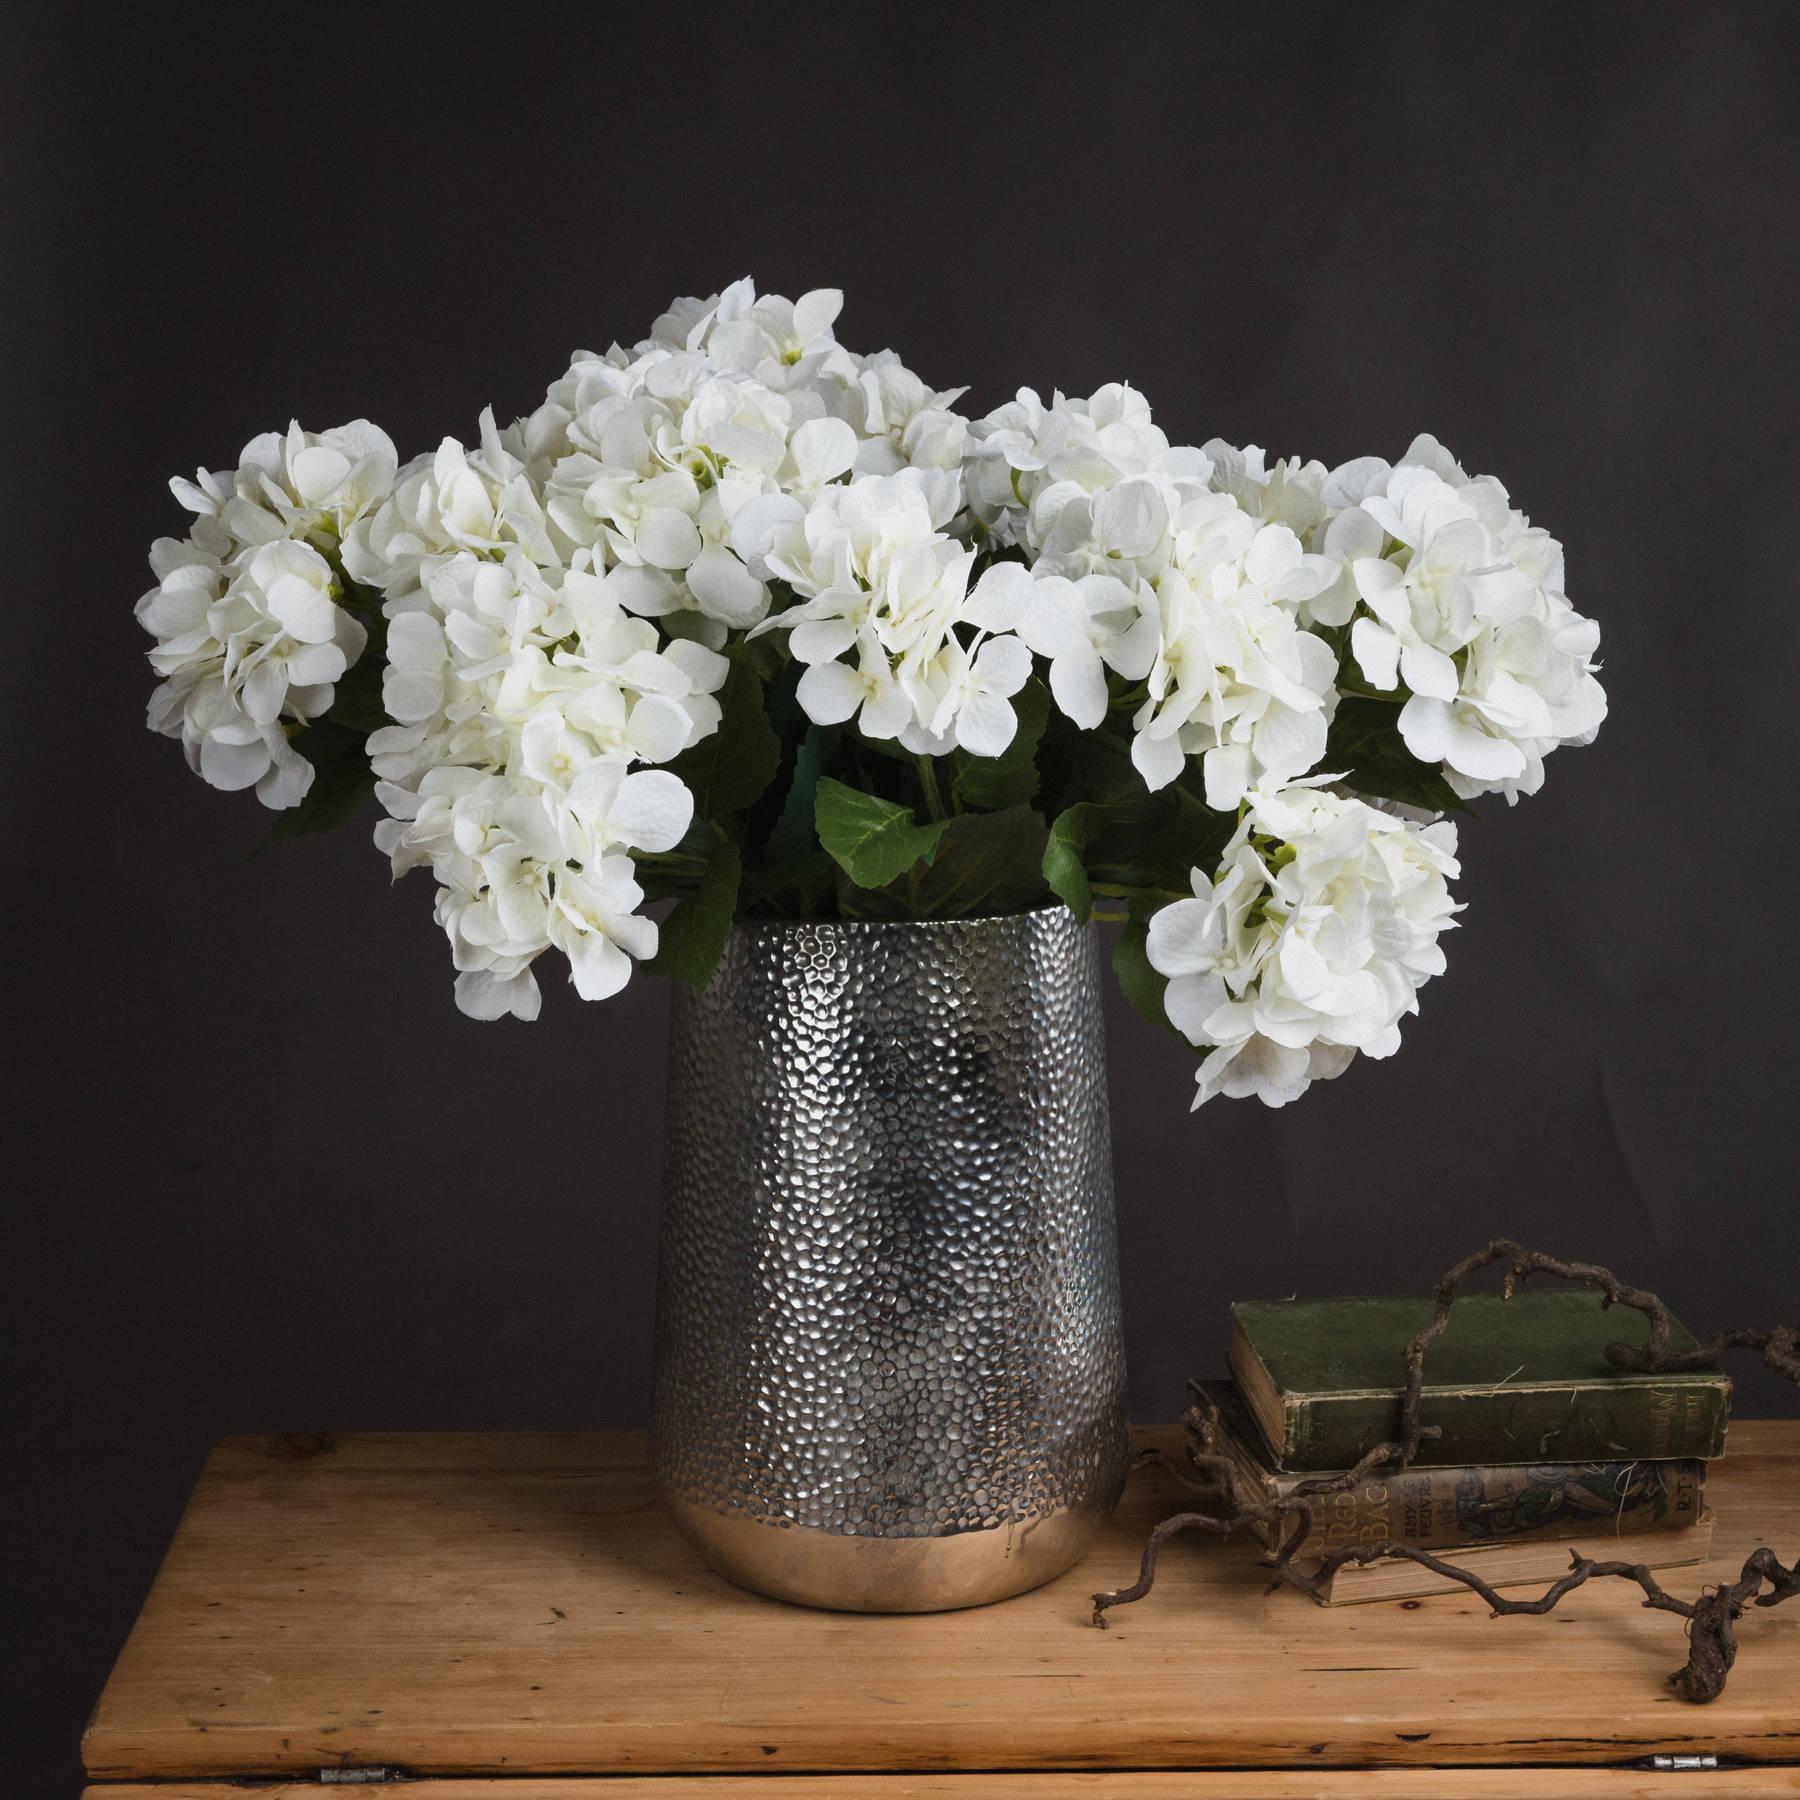 White Hydrangea Bouquet - Image 1